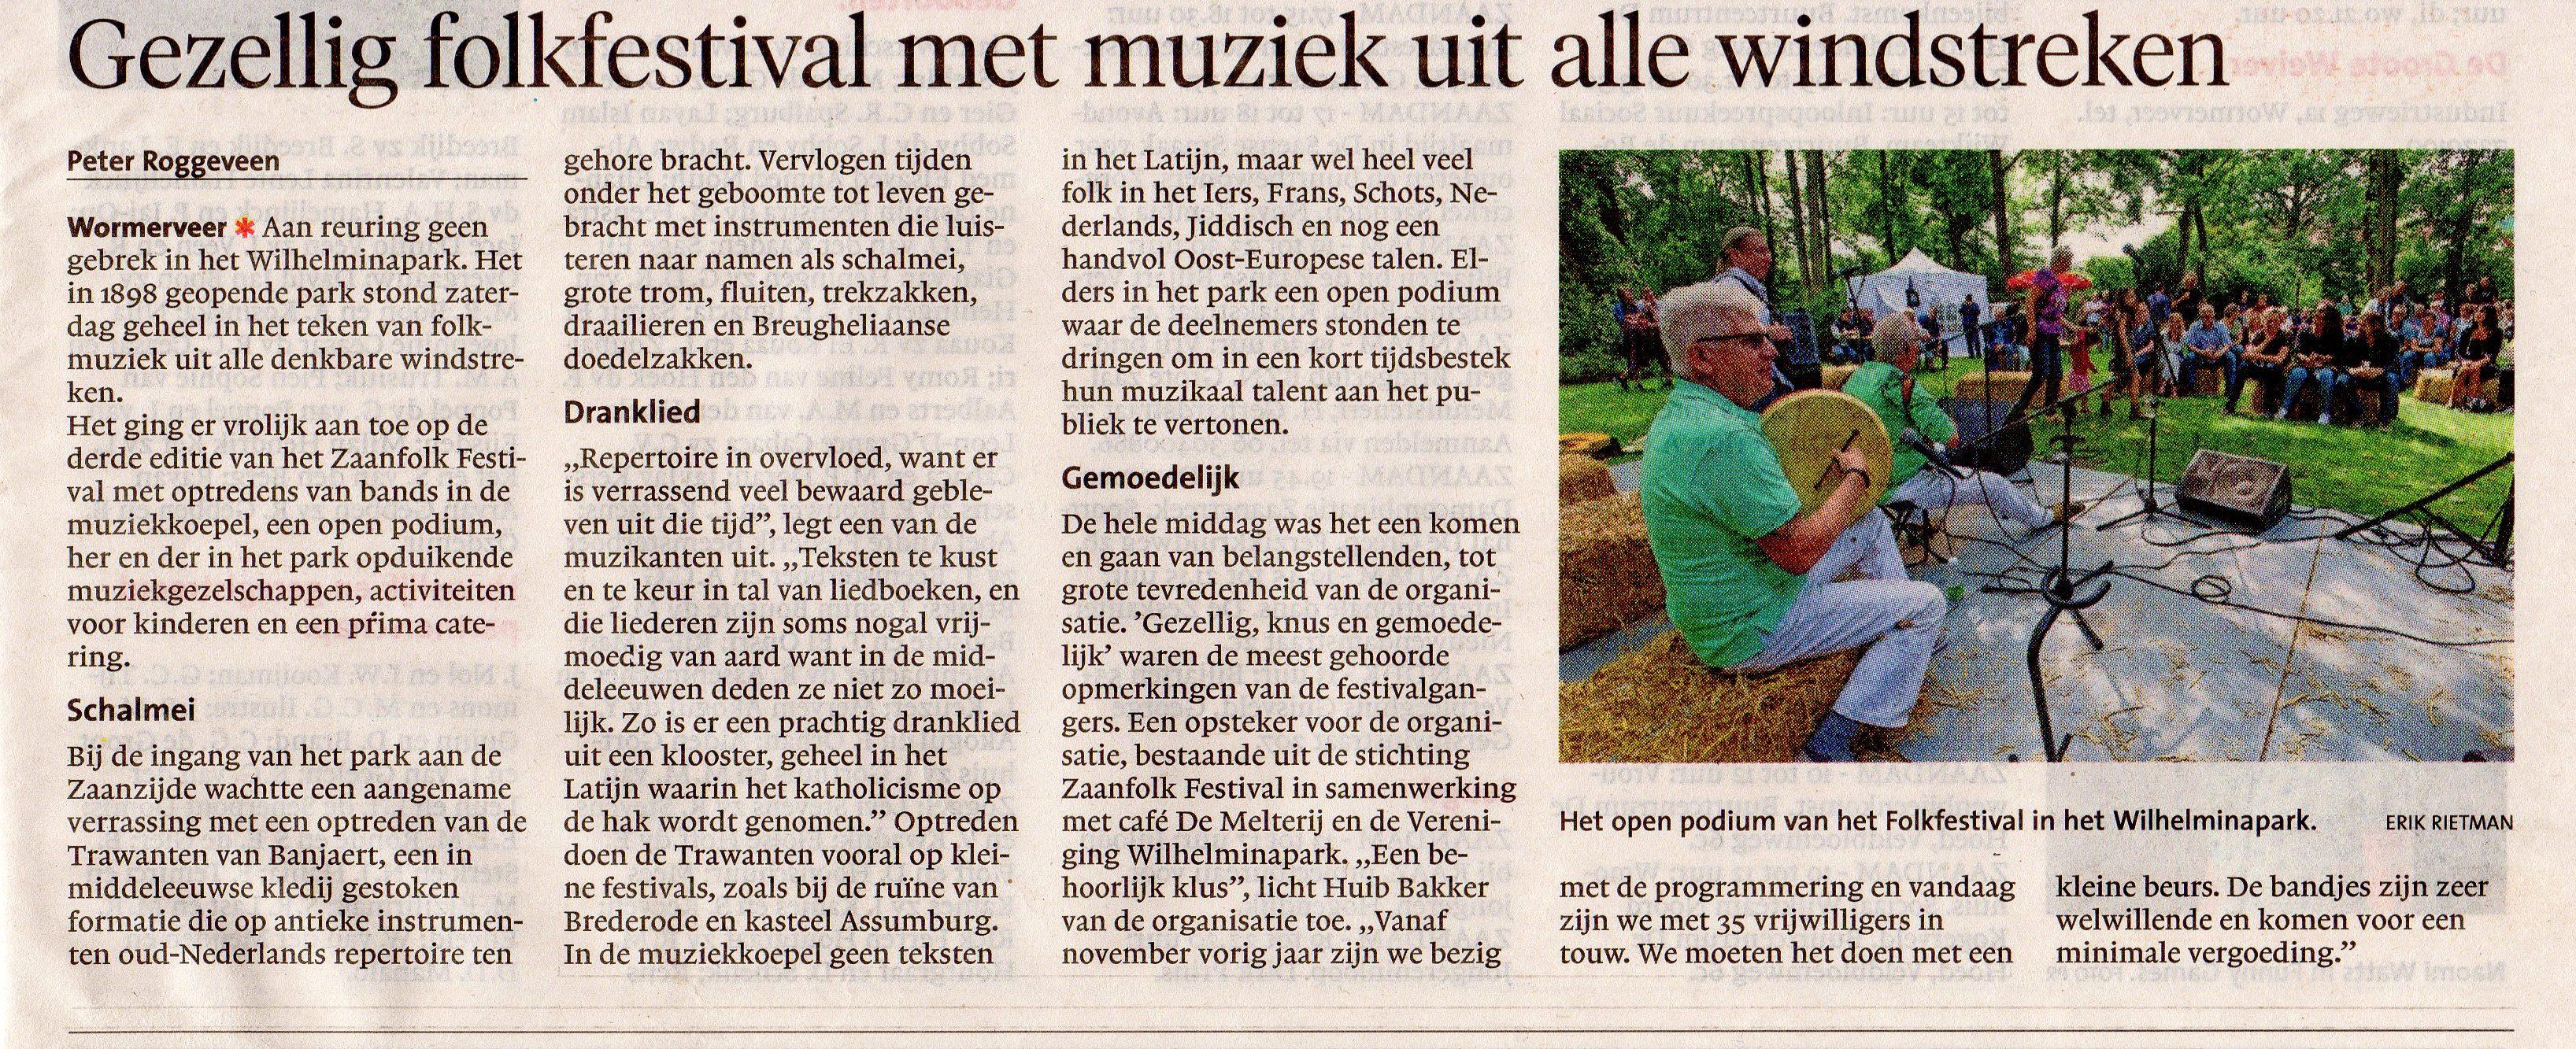 Dagblad Zaanstreek - ZaanFolk Festival 2017